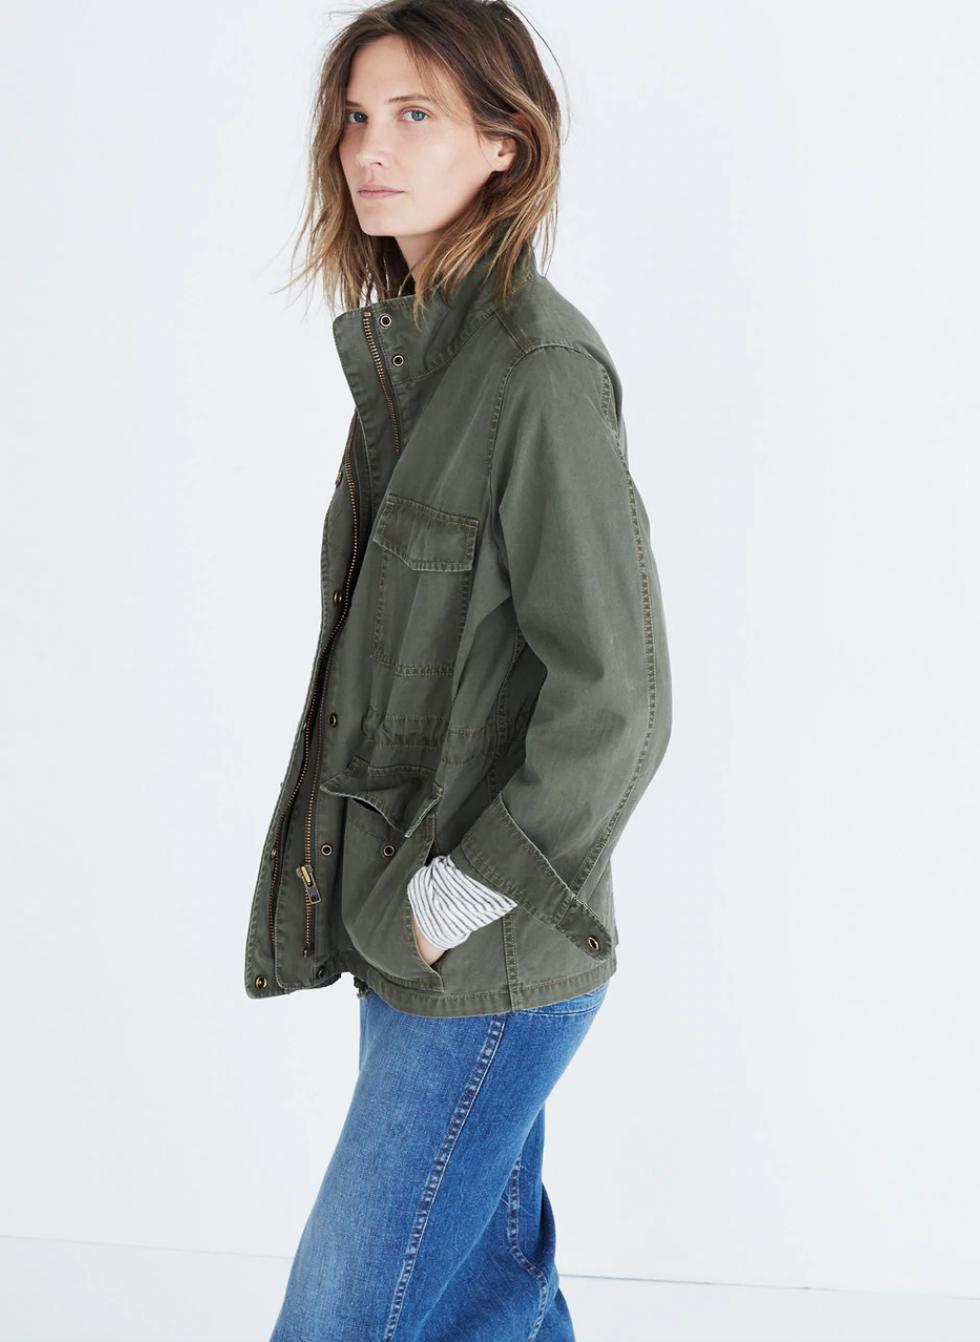 Foilage Green Surplus Jacket